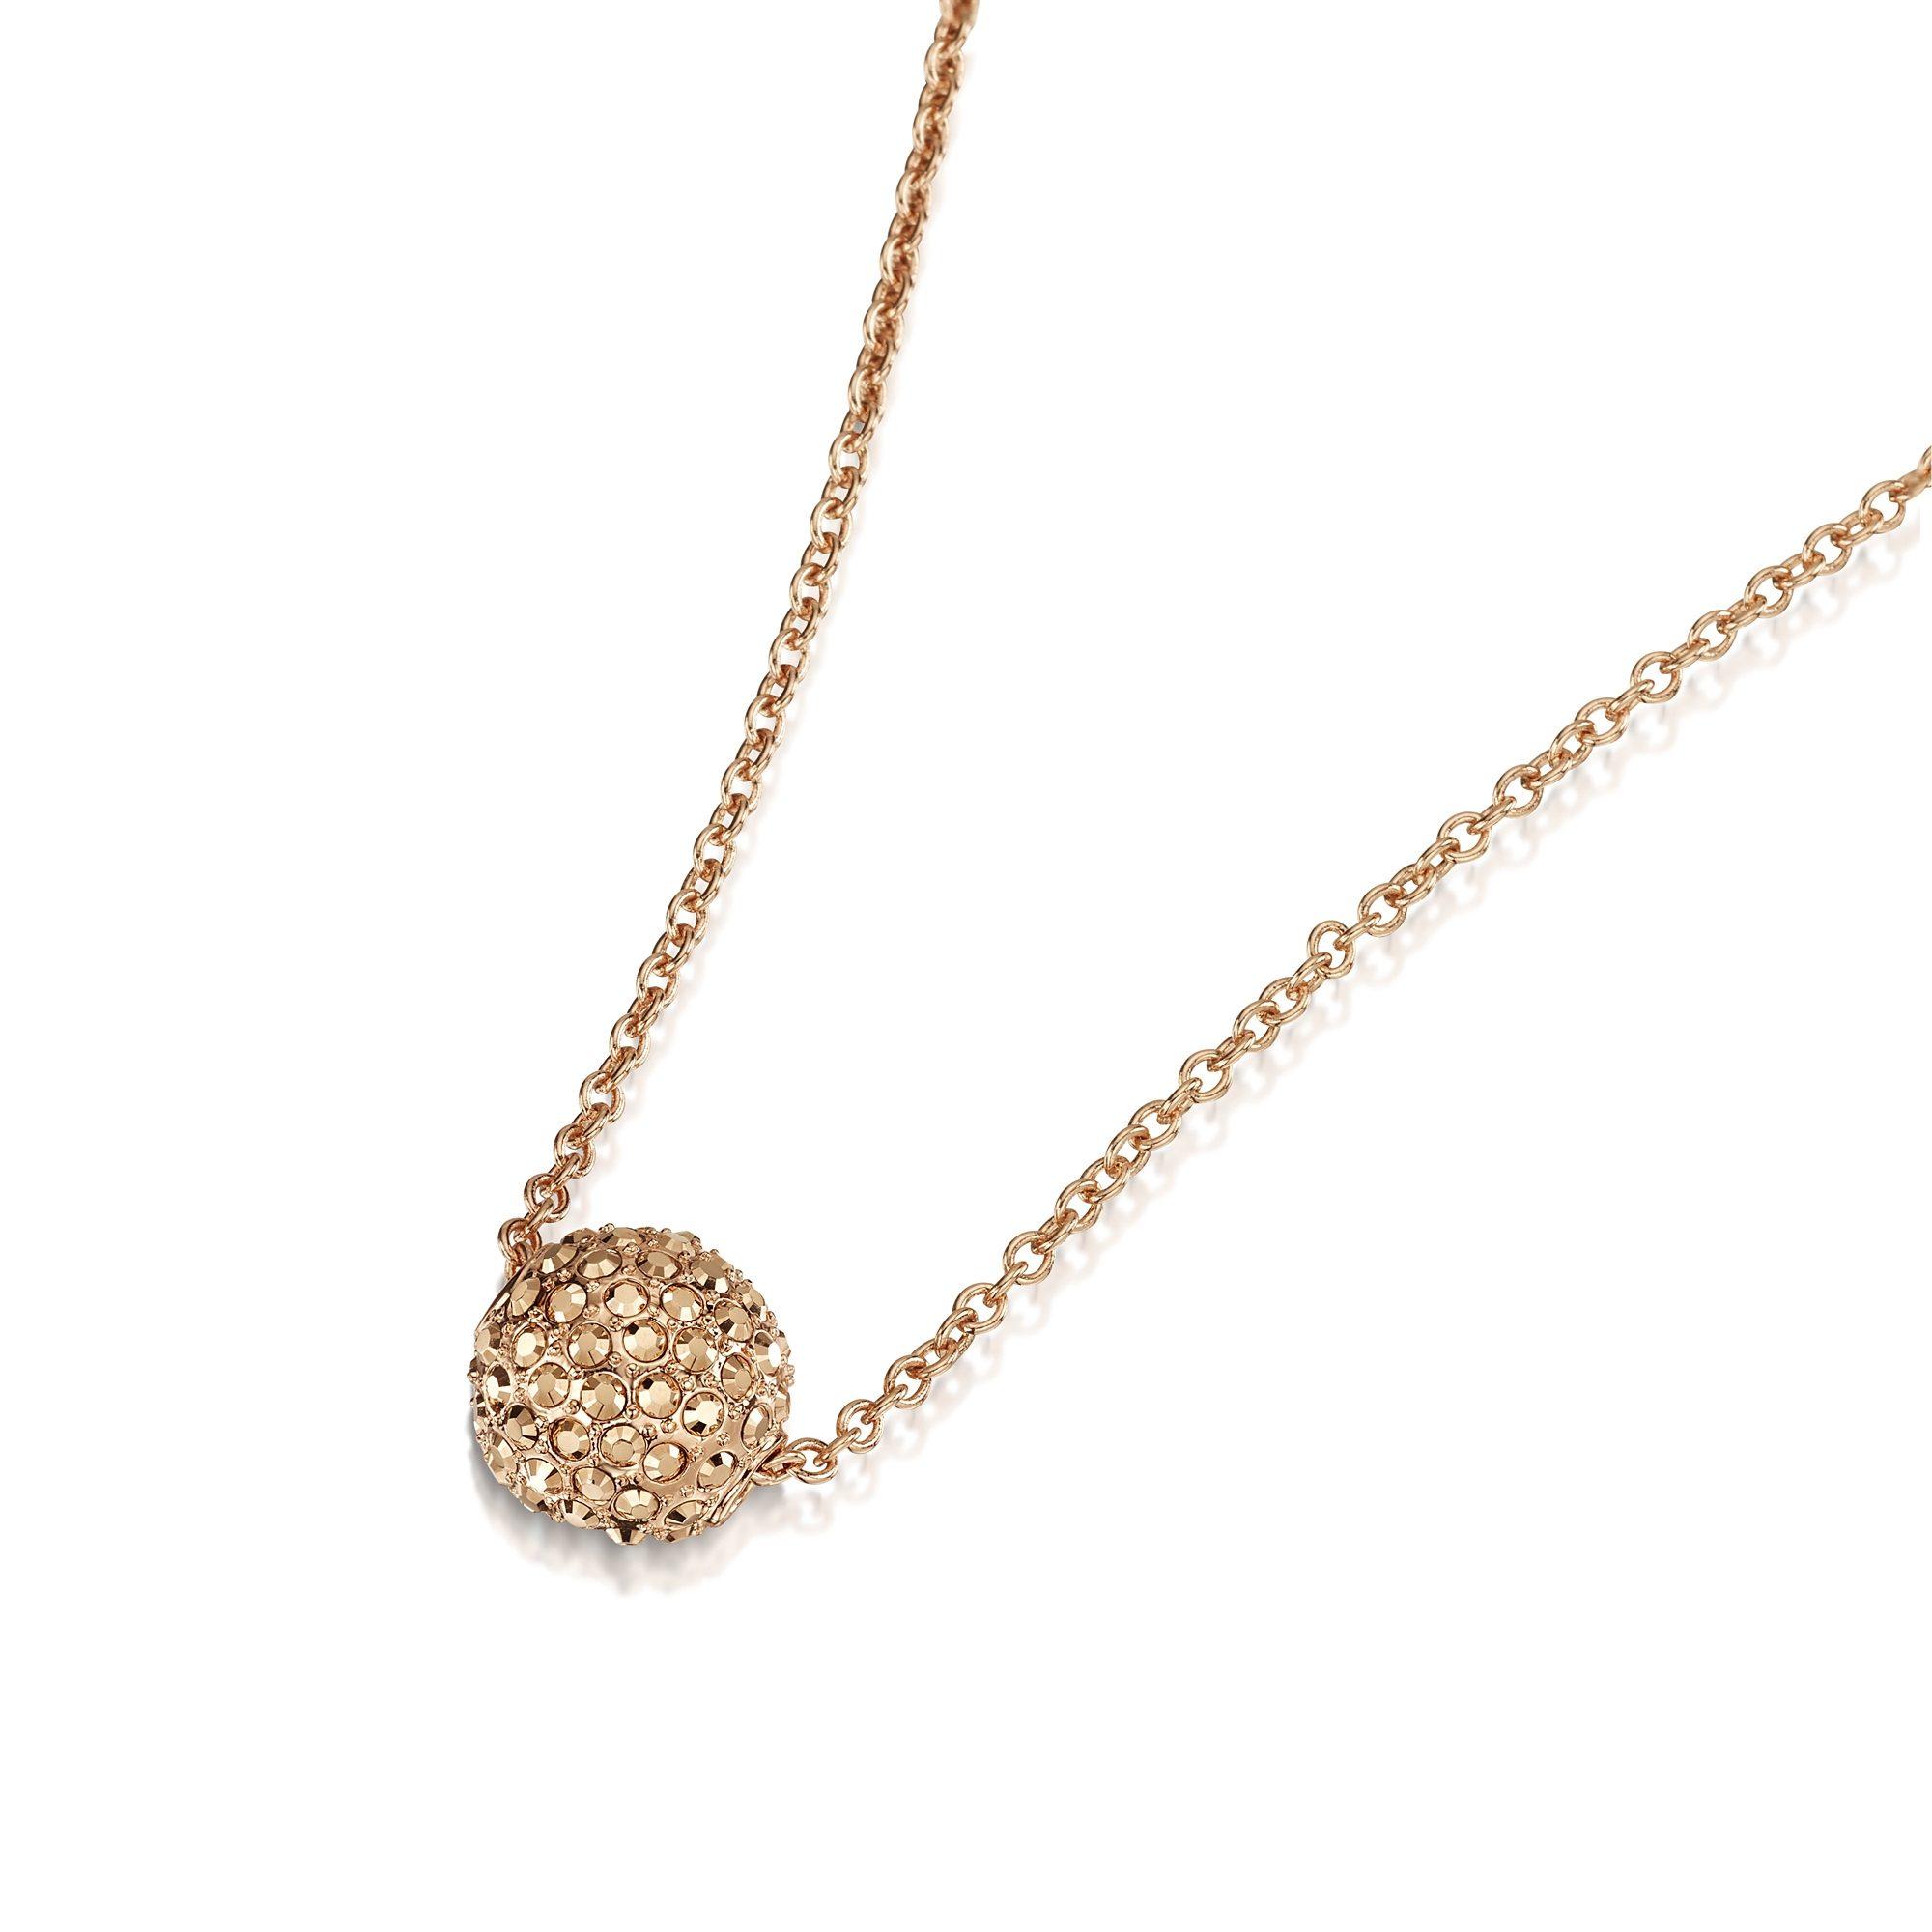 Buckley London Collier »rosevergoldet mit Kristallen«